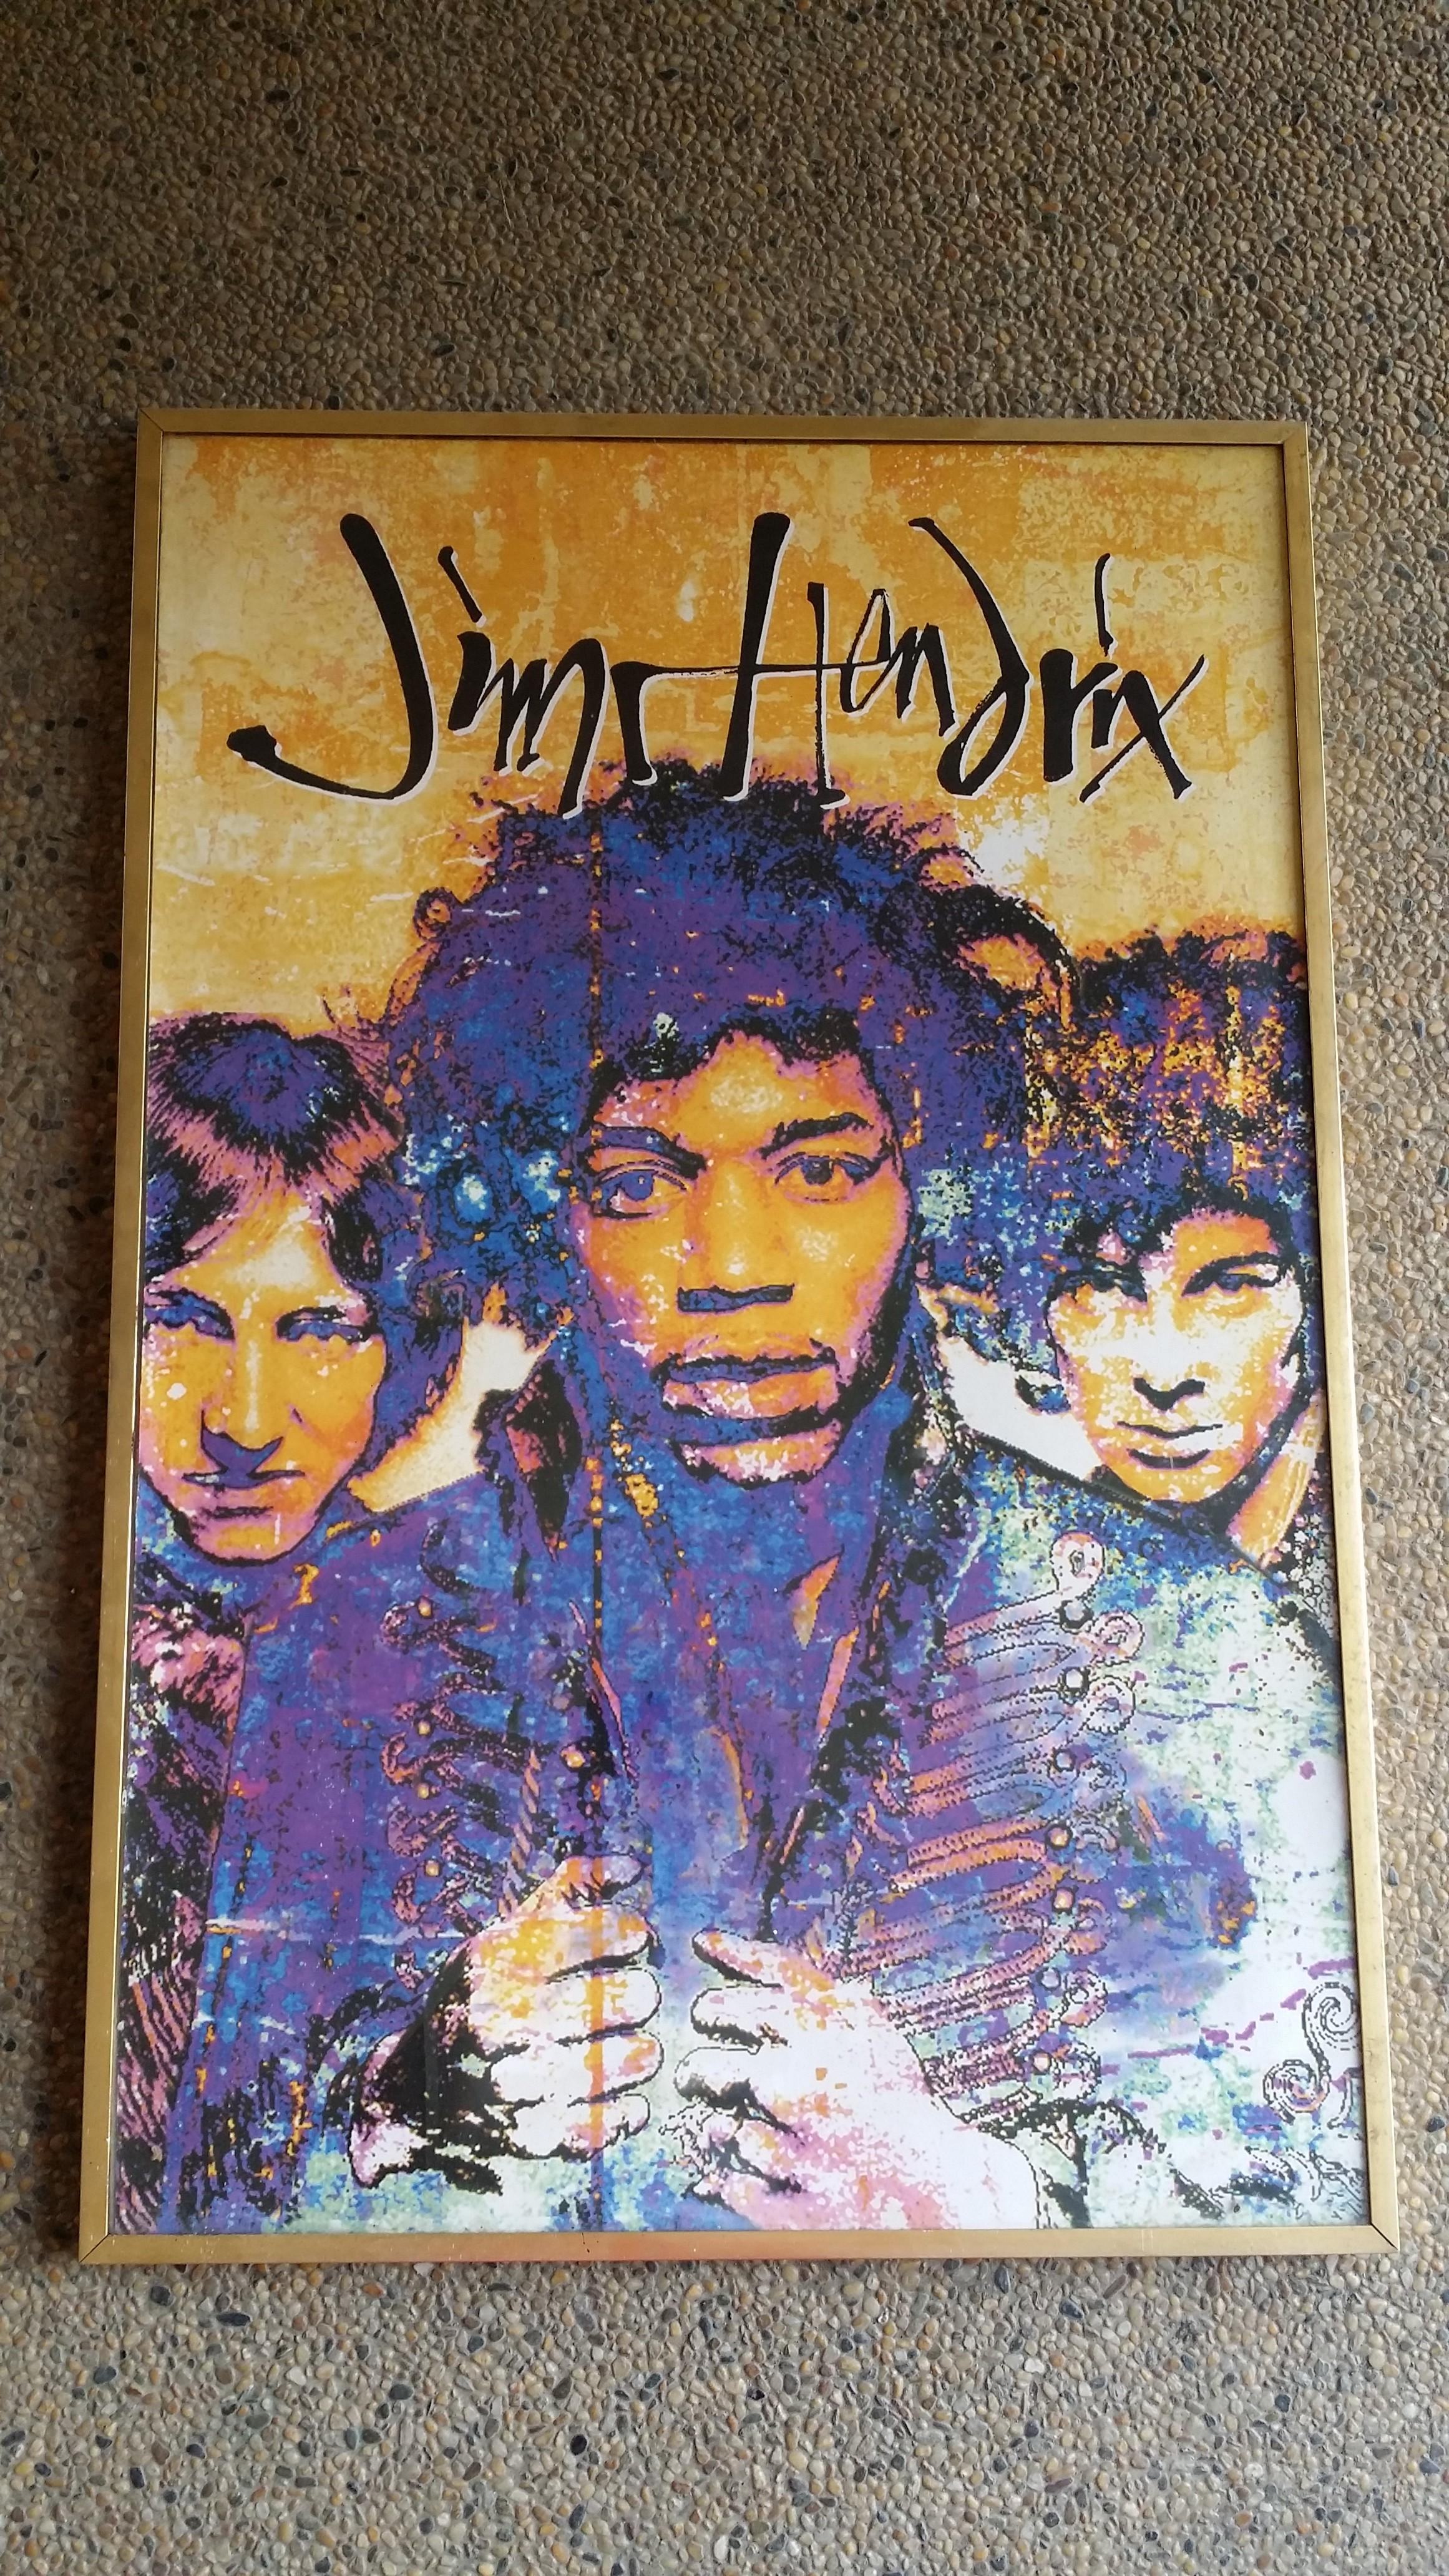 Jimi Hendrix Poster 1